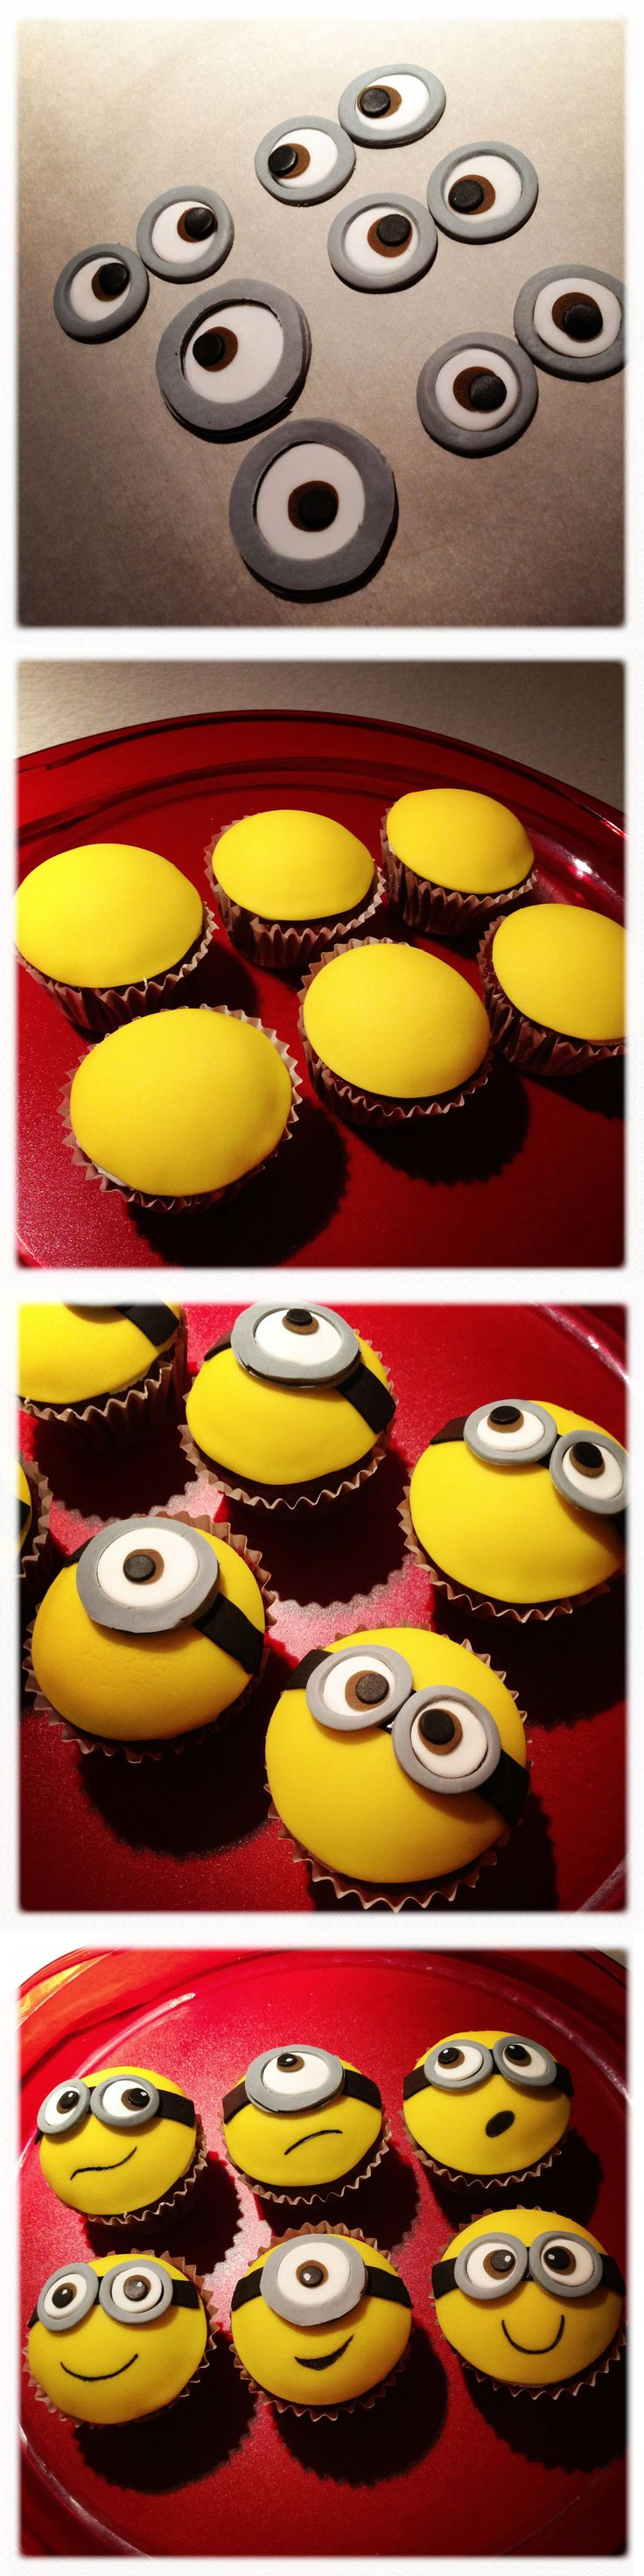 LaBKRY Minions Cupcakes!